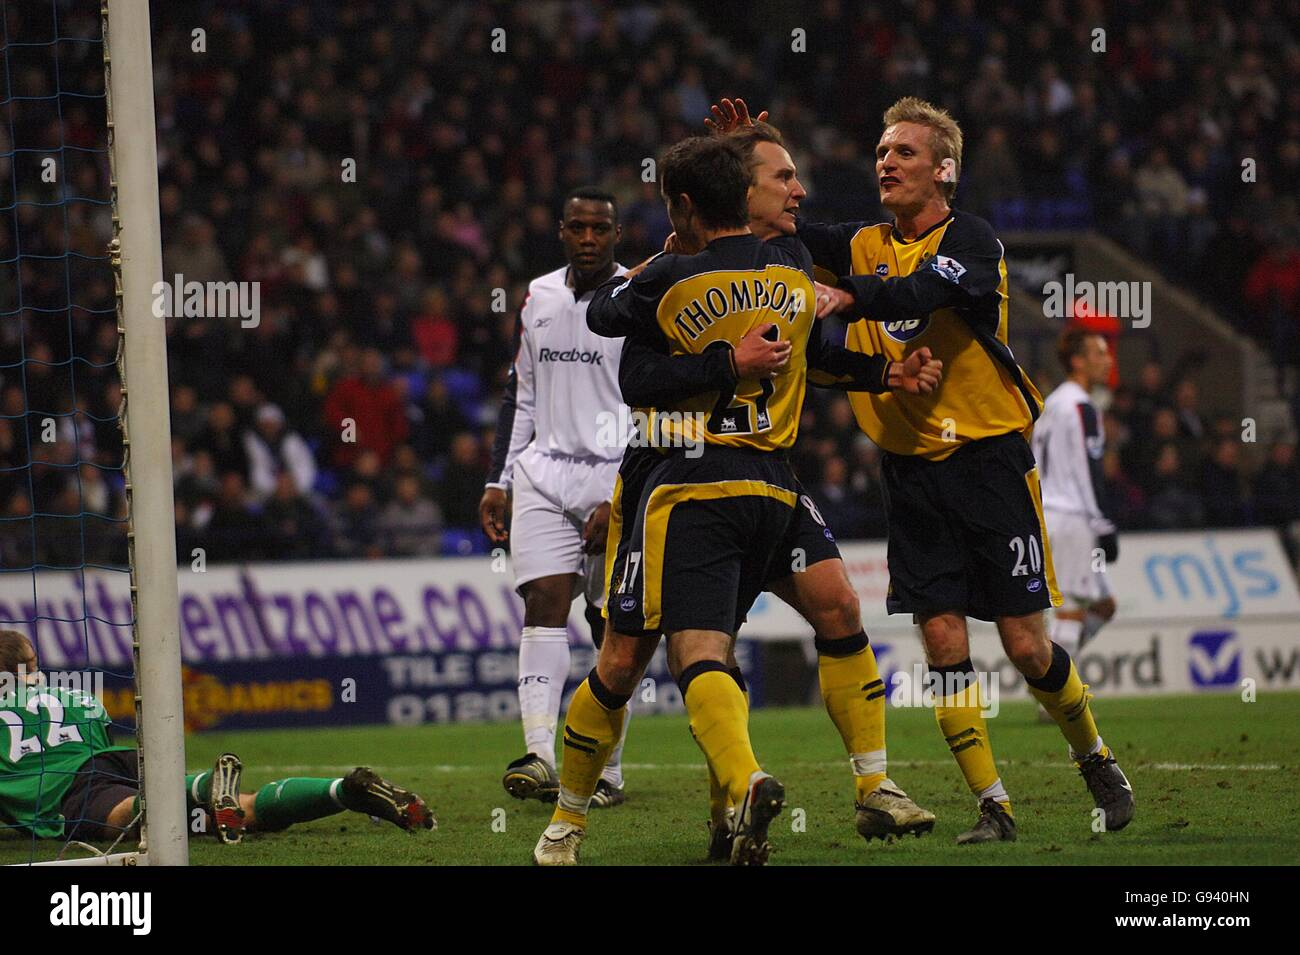 Soccer - FA Barclays Premiership - Bolton Wanderers v Wigan Athletic - Reebok Stadium - Stock Image